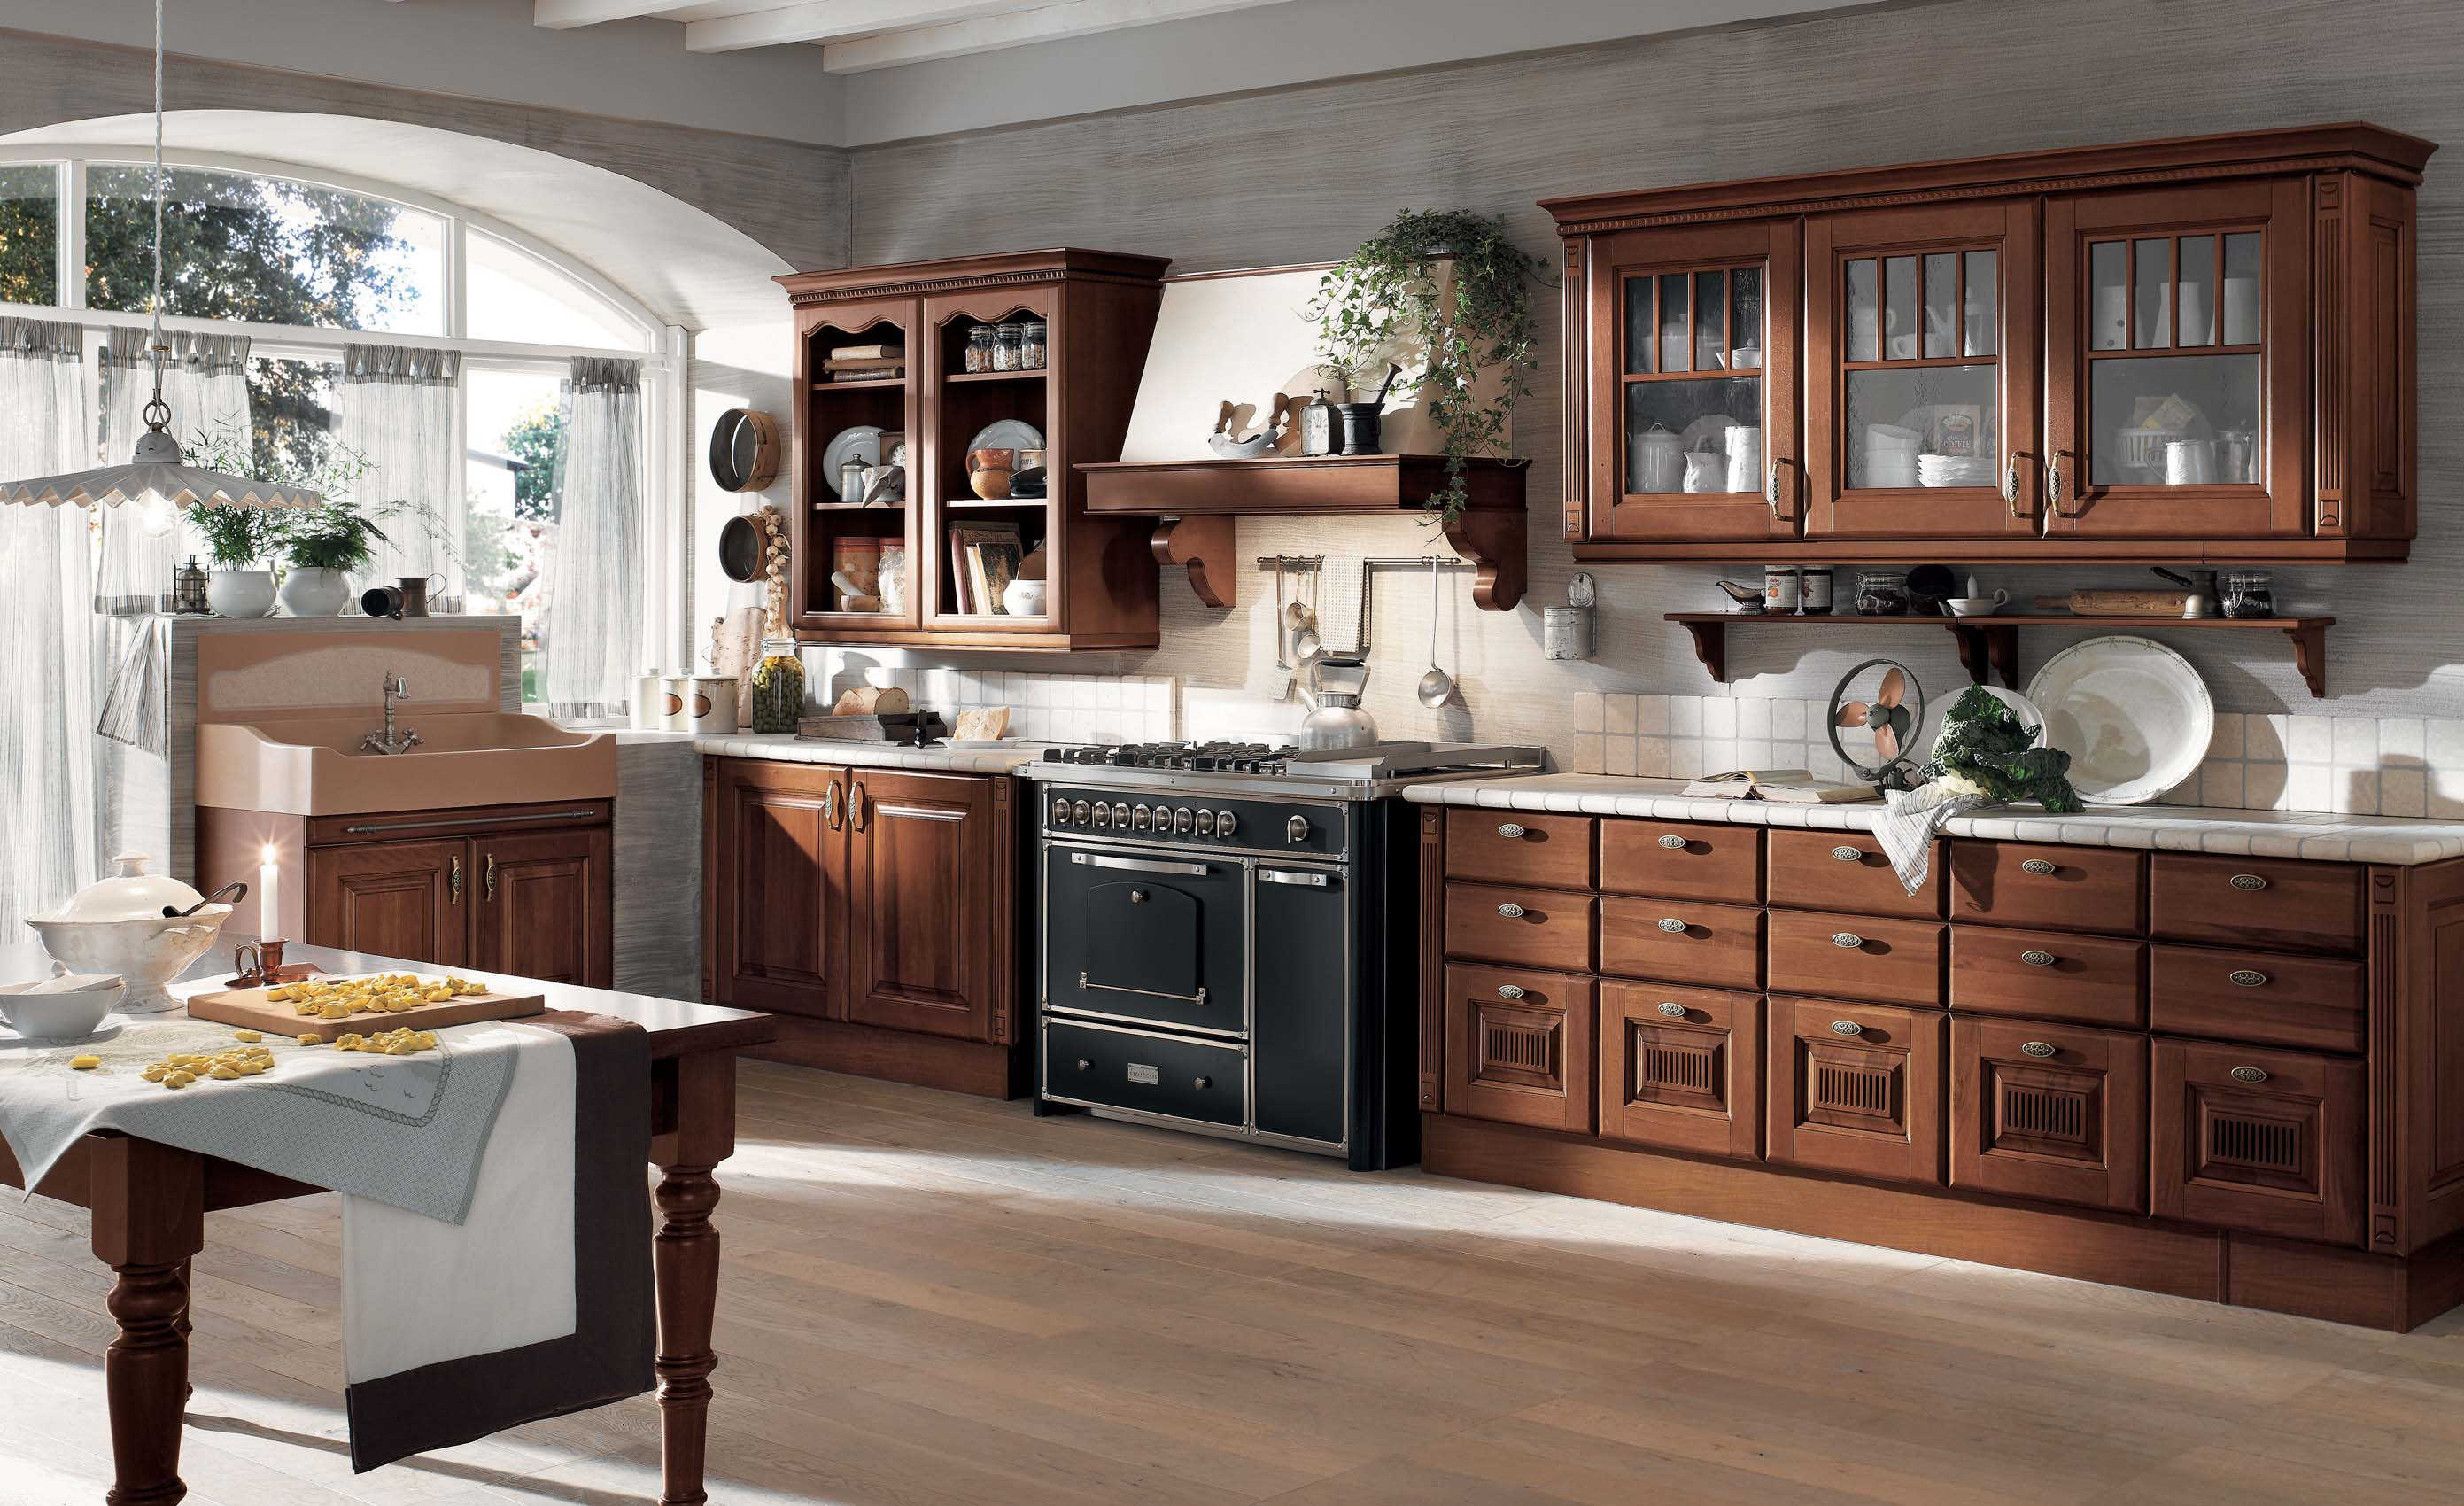 Bucatarie clasica vs bucatarie moderna amenajari for J and b kitchen designs